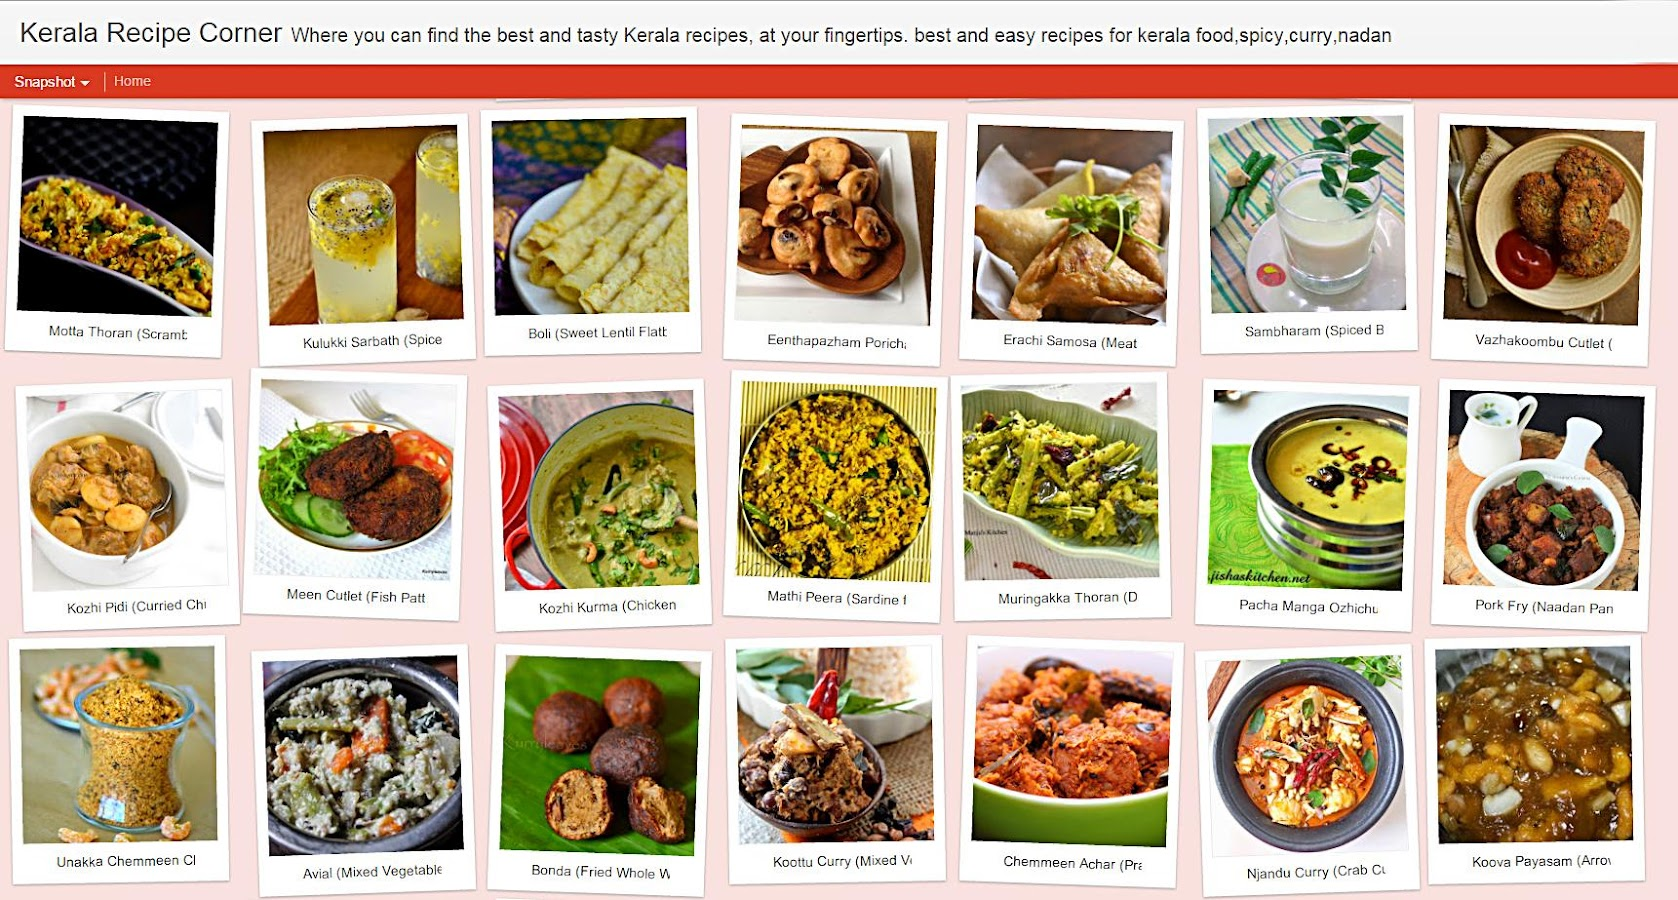 Kerala recipe corner android apps on google play kerala recipe corner screenshot forumfinder Choice Image